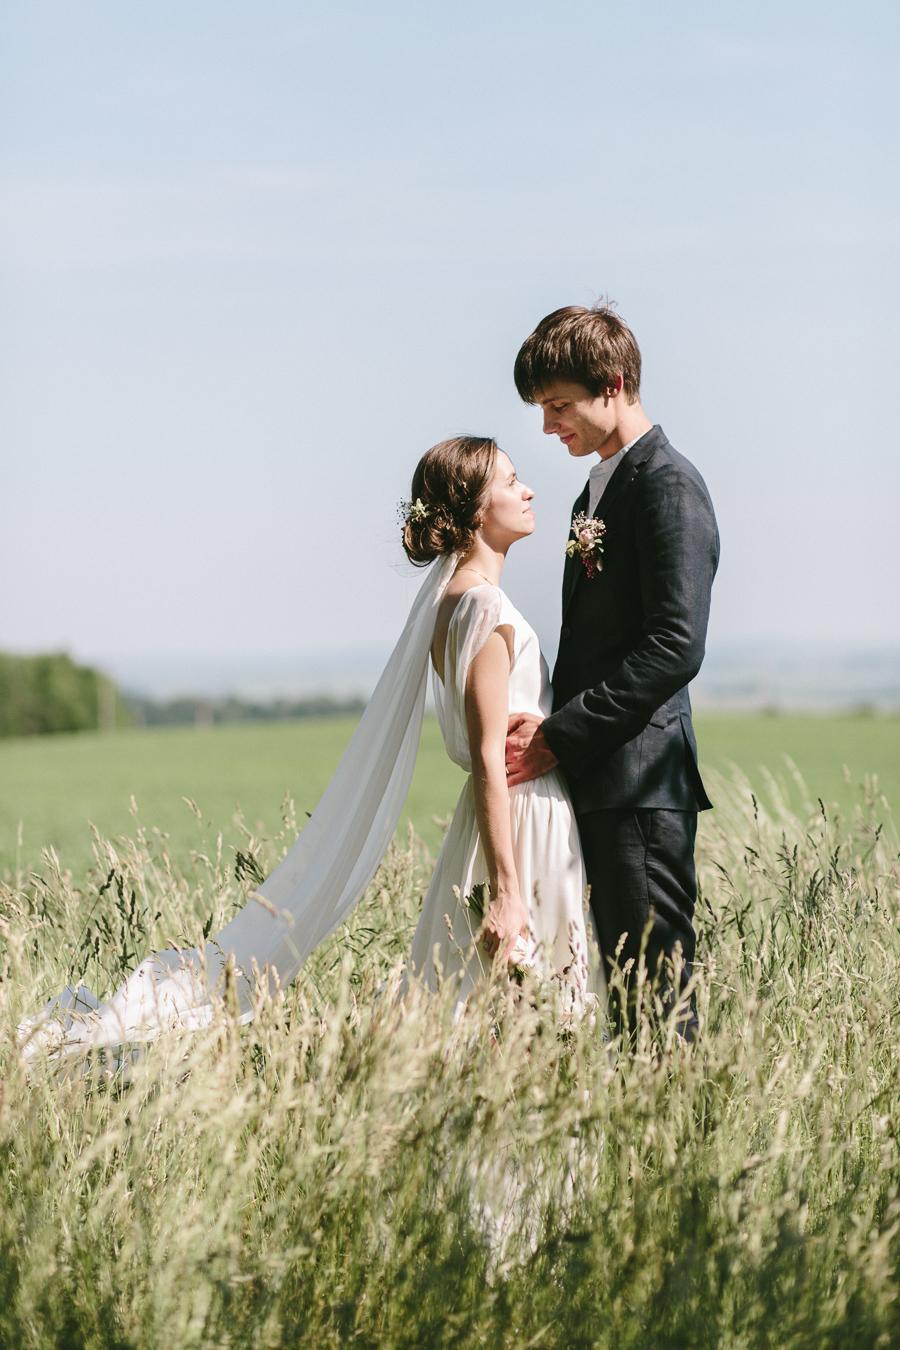 081-everbay-wedding-kaja&ondra-IMG_5544.jpg